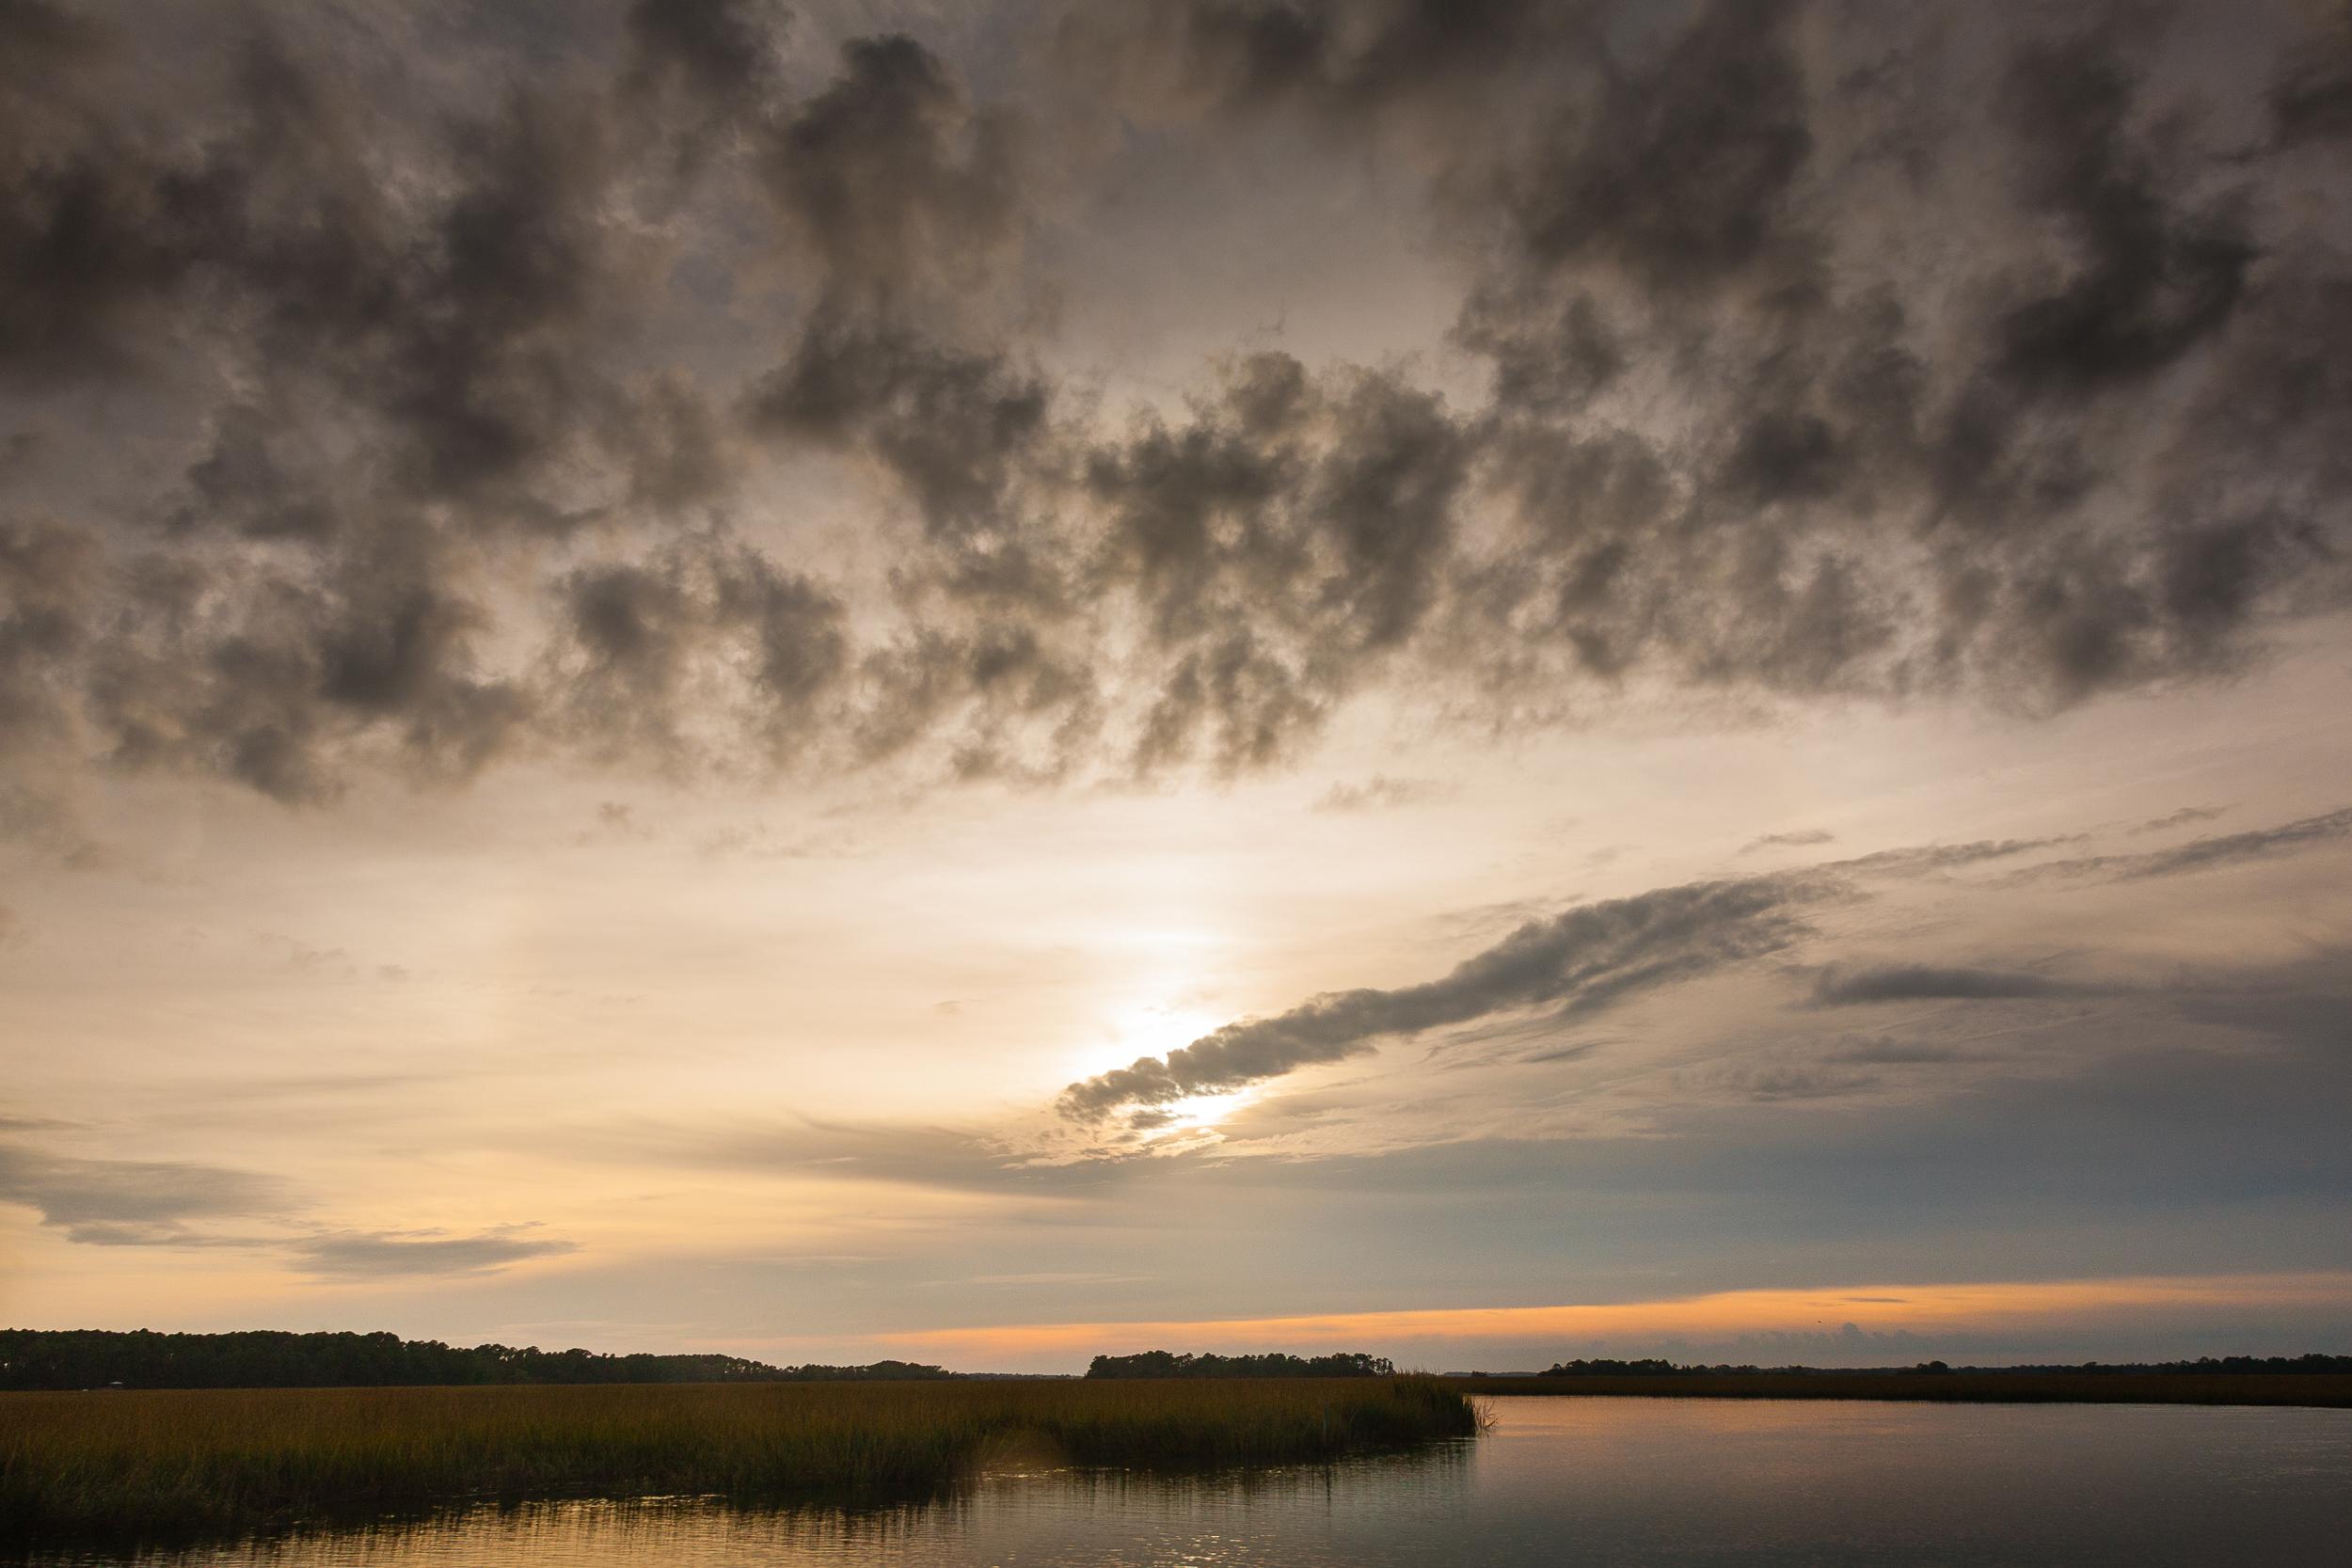 Late light over tidal wetlands, Folly Island, South Carolina.